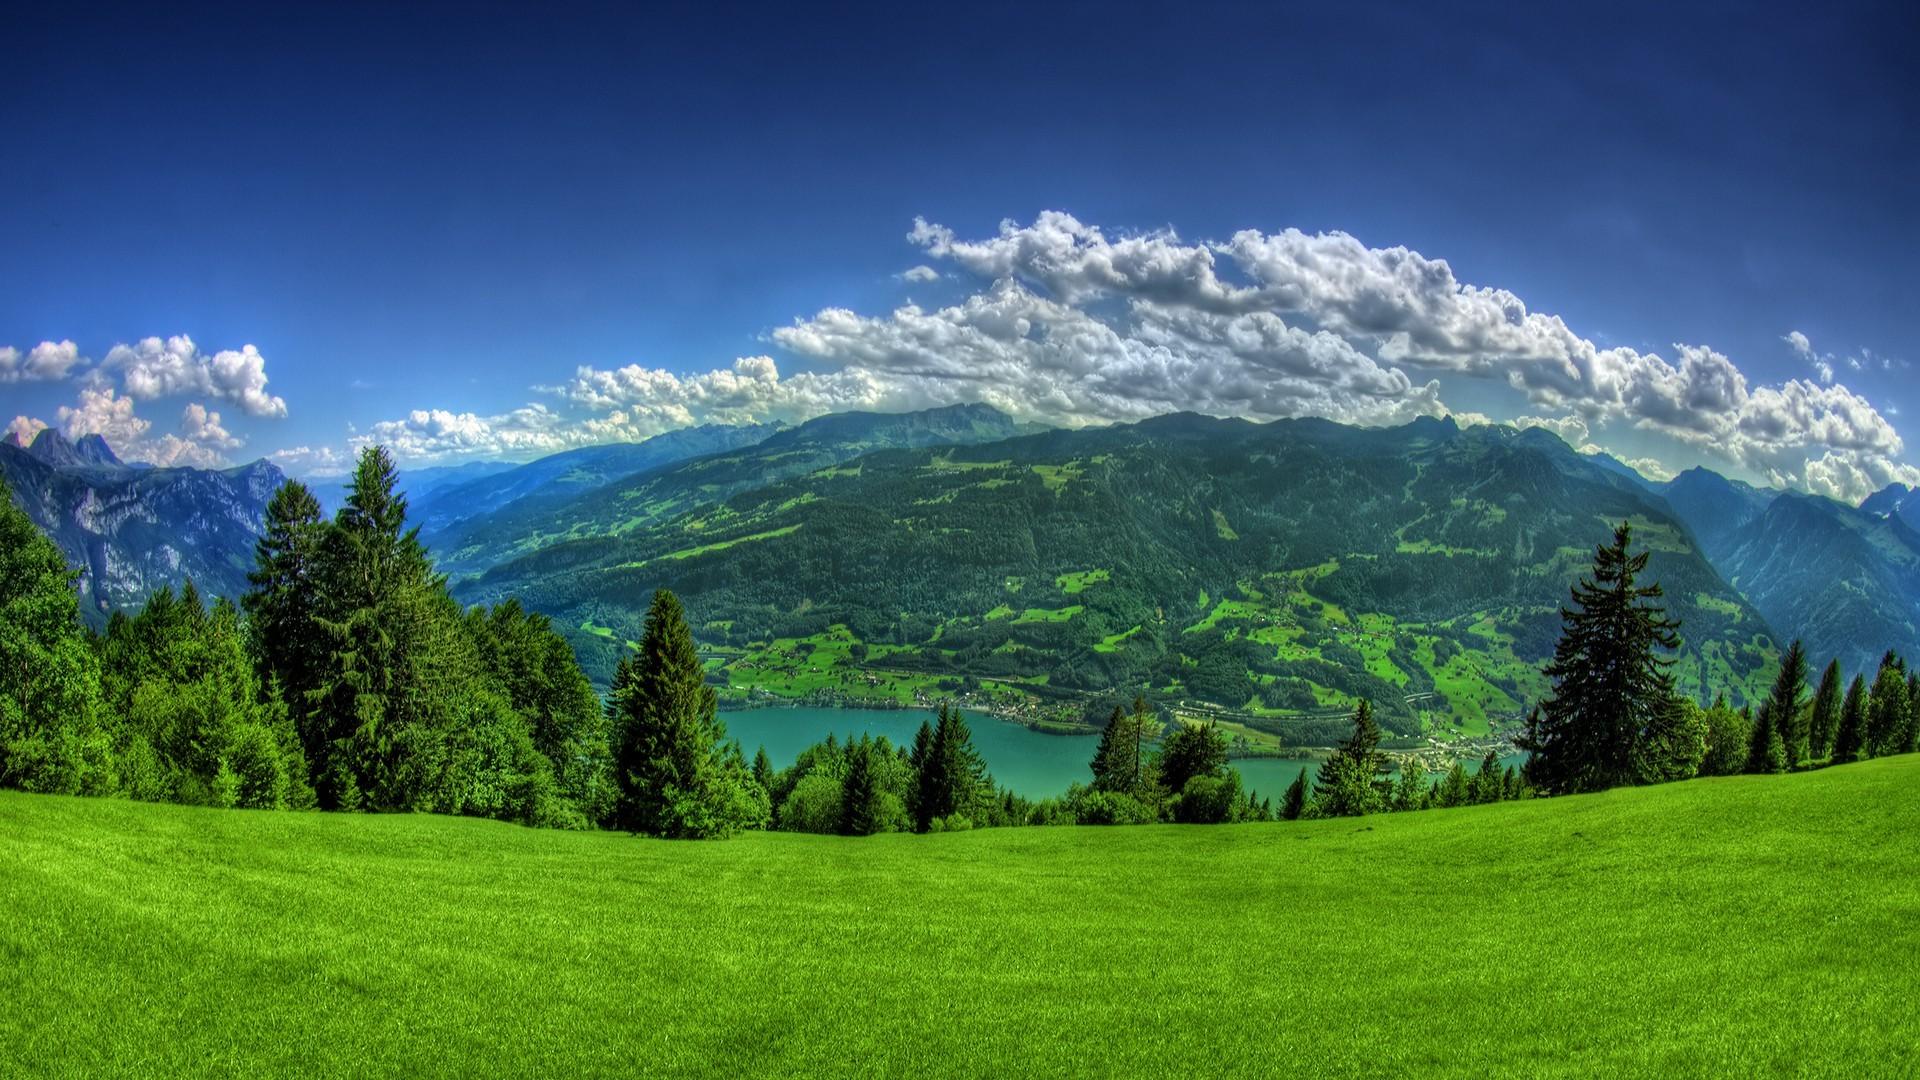 Res: 1920x1080, ... BEAUTIFUL NATURE BEAUTY WALLPAPERS HD - Ourdunya.com   Travel ...